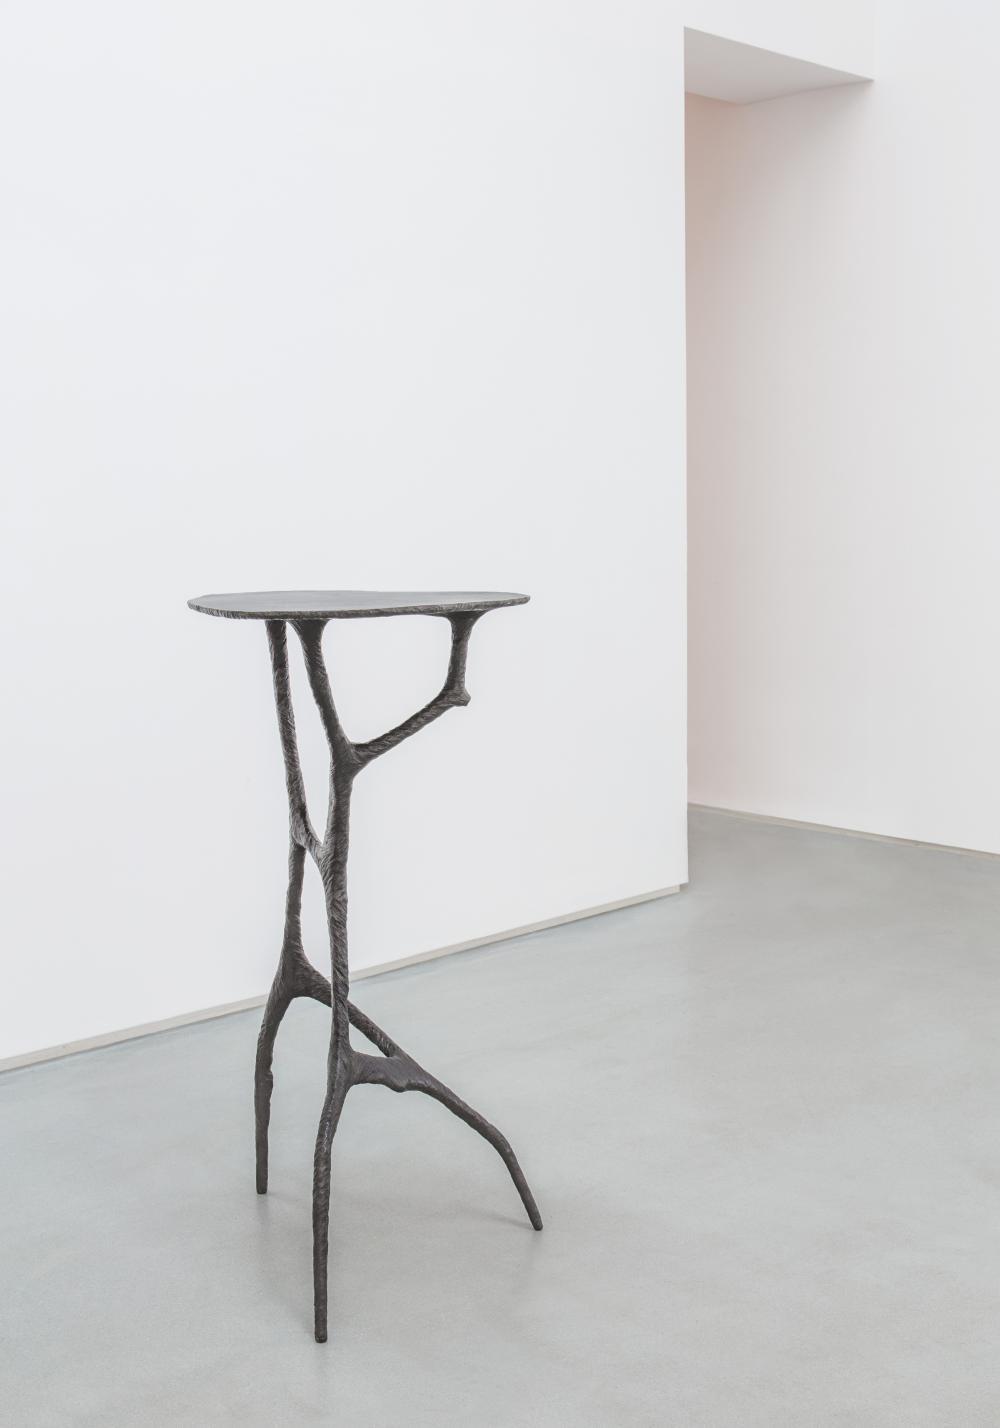 Art furniture The best Art furniture by Charles Trevelyan The best Art furniture by Charles Trevelyan I Lobo you11